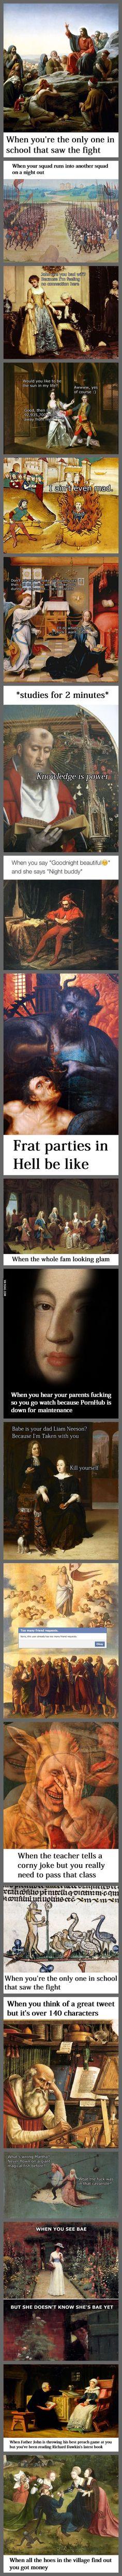 Classical Art Memes Latest (Part-13)